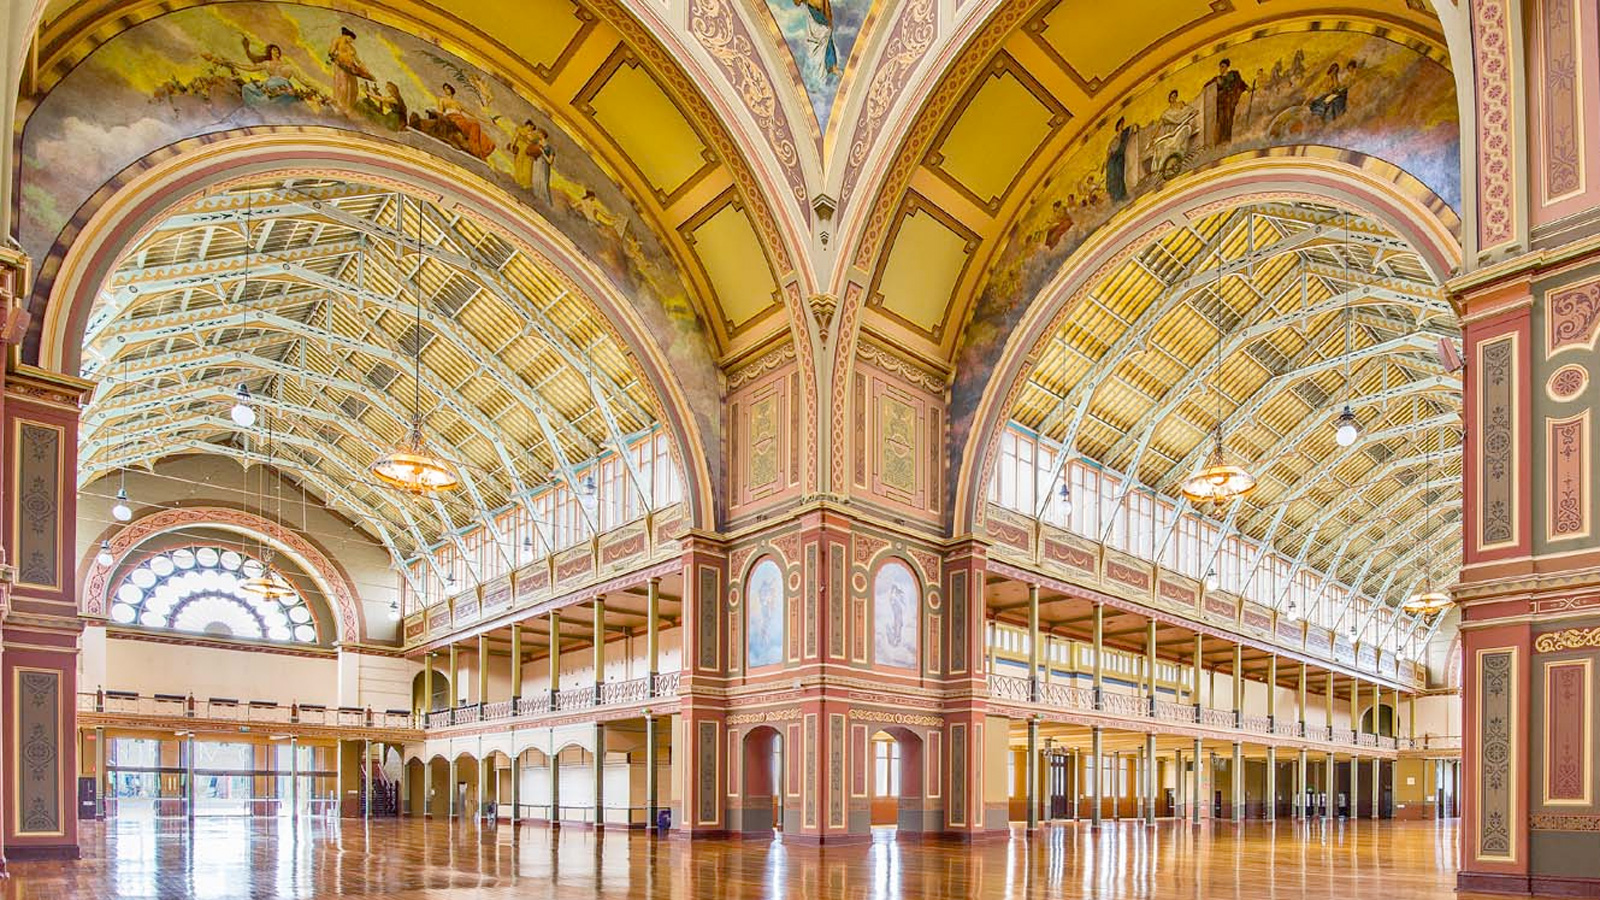 Royal Exhibition Building, Carlton, Melbourne, Victoria, Australia